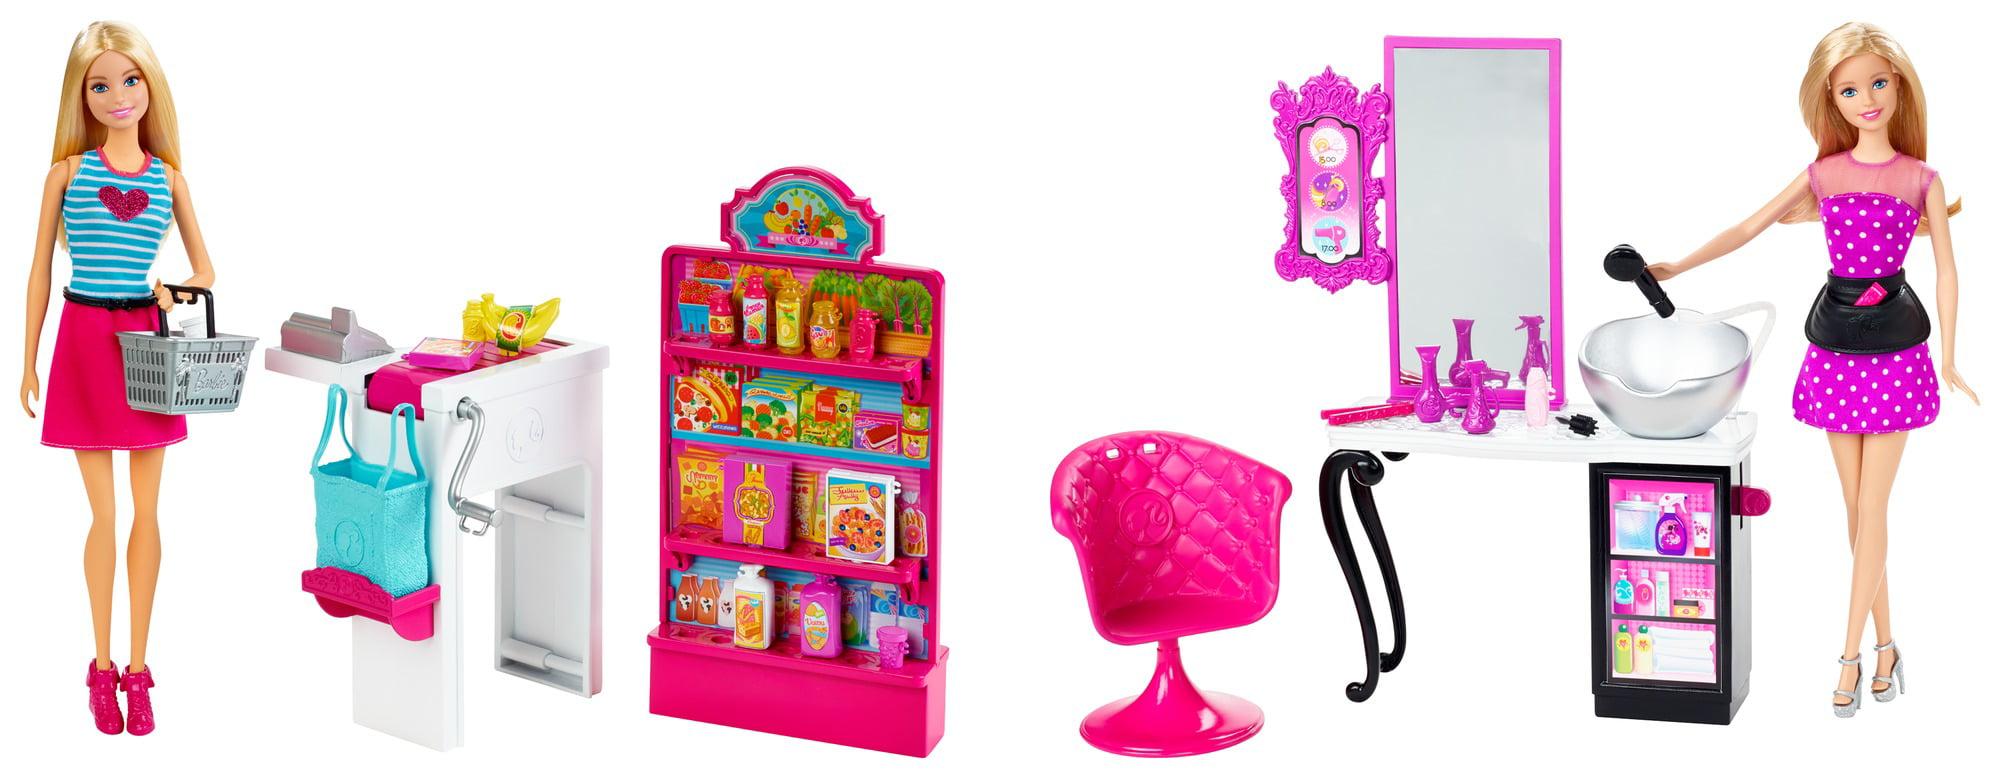 Barbie Malibu Ave Shop with Doll Playset Assortment Parent by Mattel